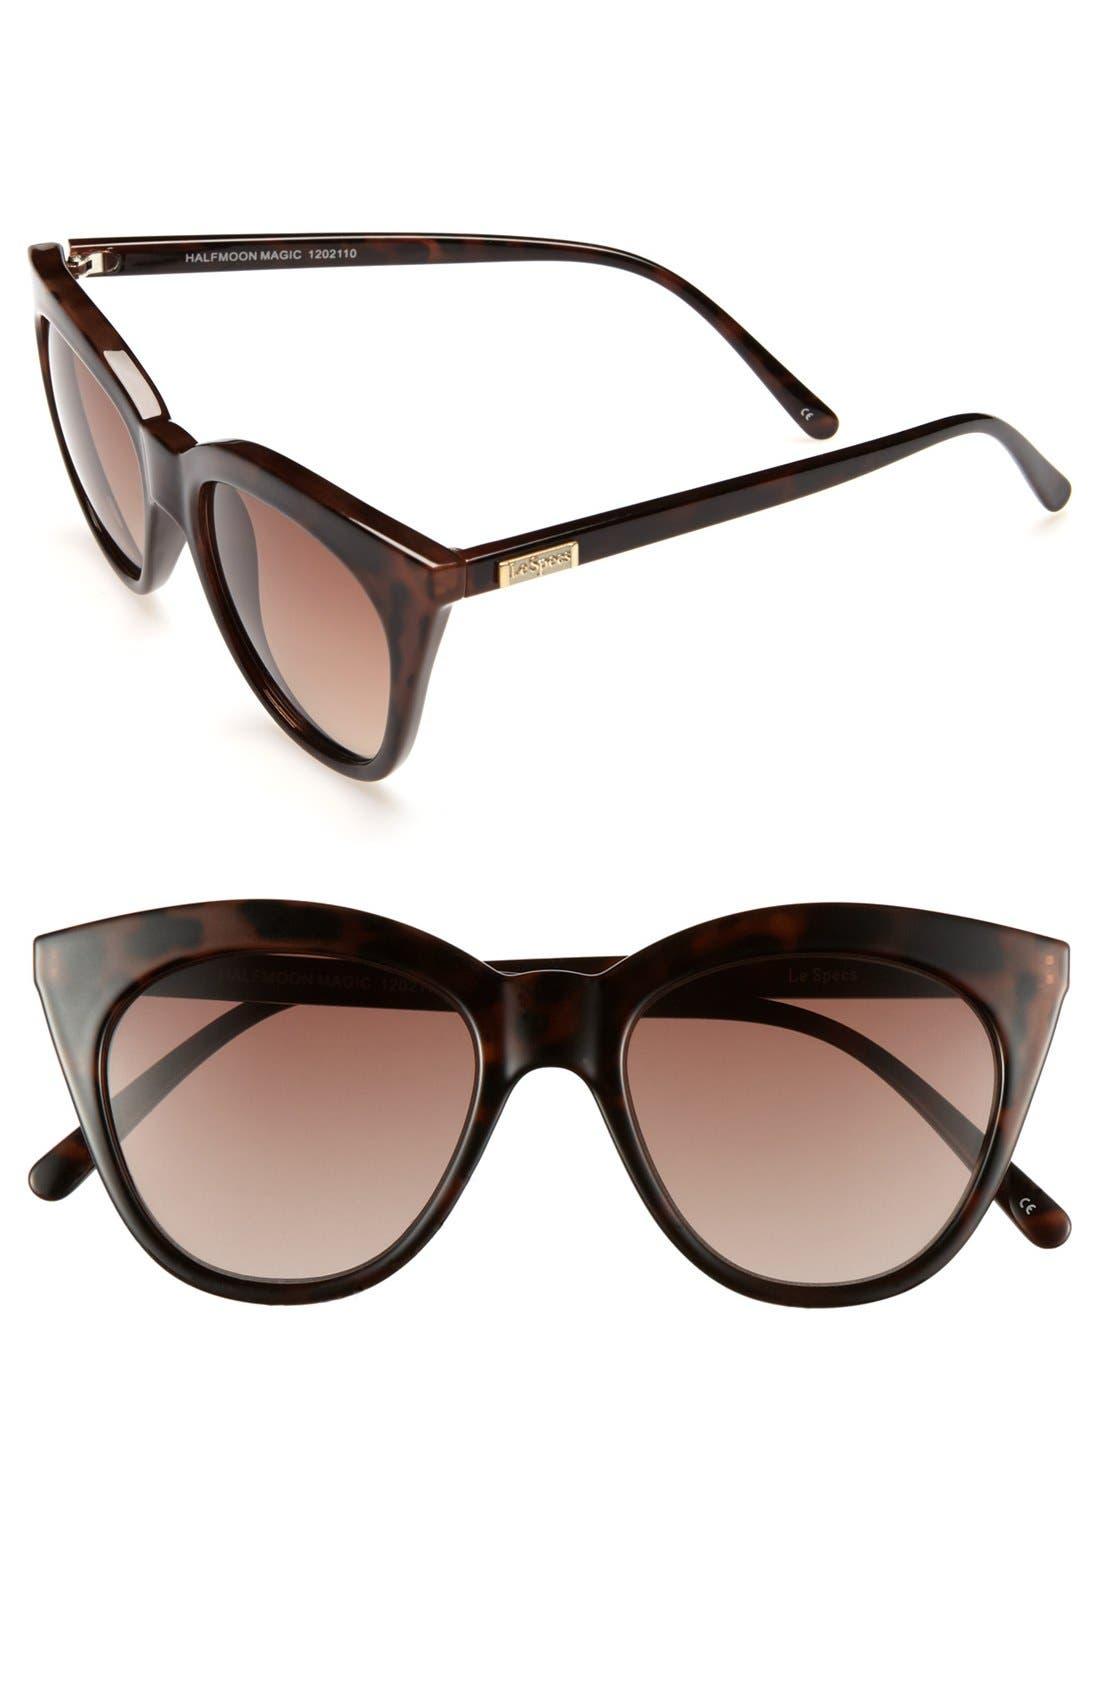 Alternate Image 1 Selected - Le Specs 'Halfmoon Magic' Sunglasses